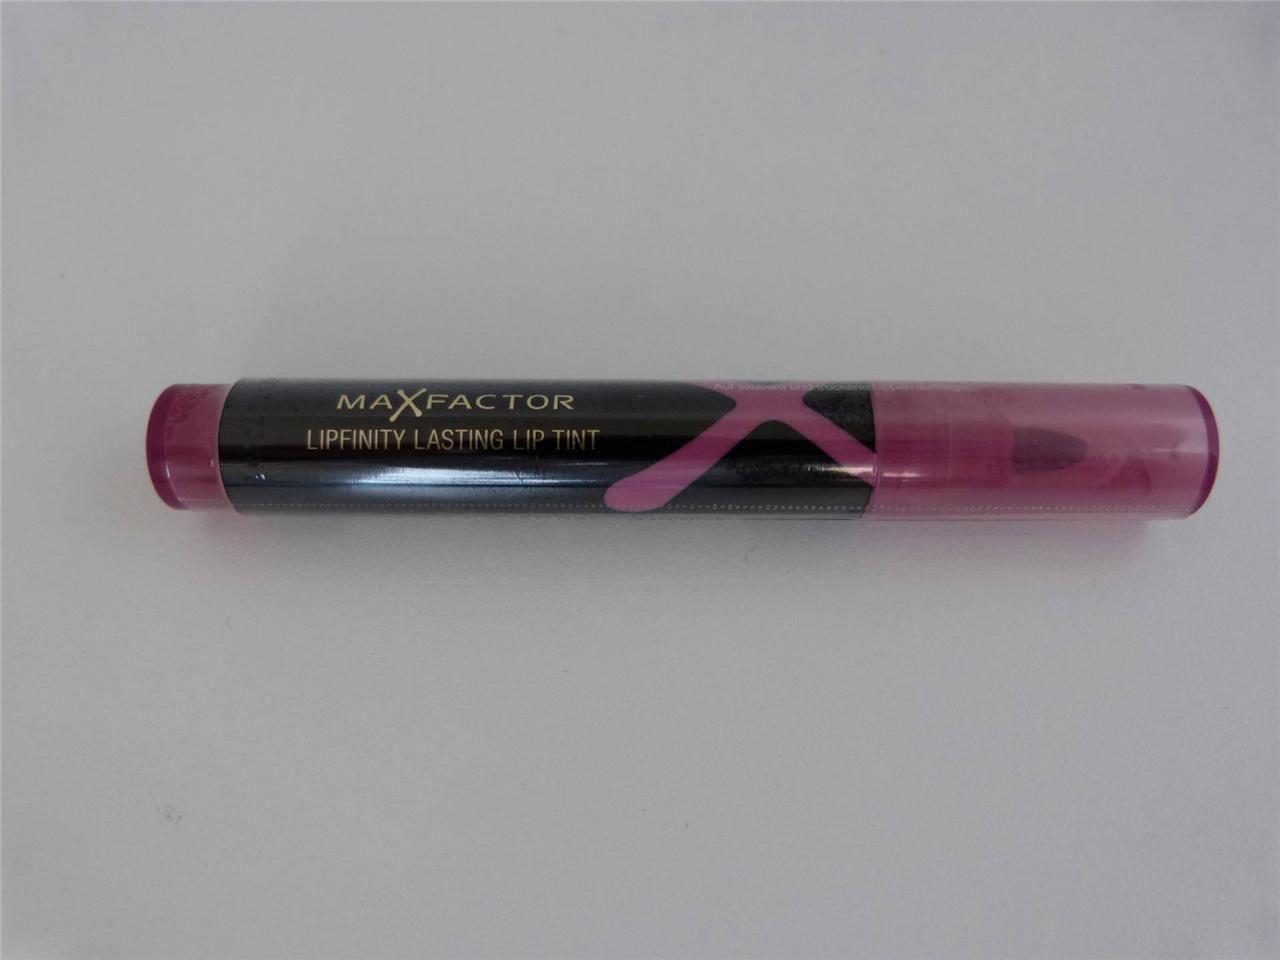 3-x-Max-Factor-Lipfinity-Lasting-Lip-Tint-2-5g-Various-Shades